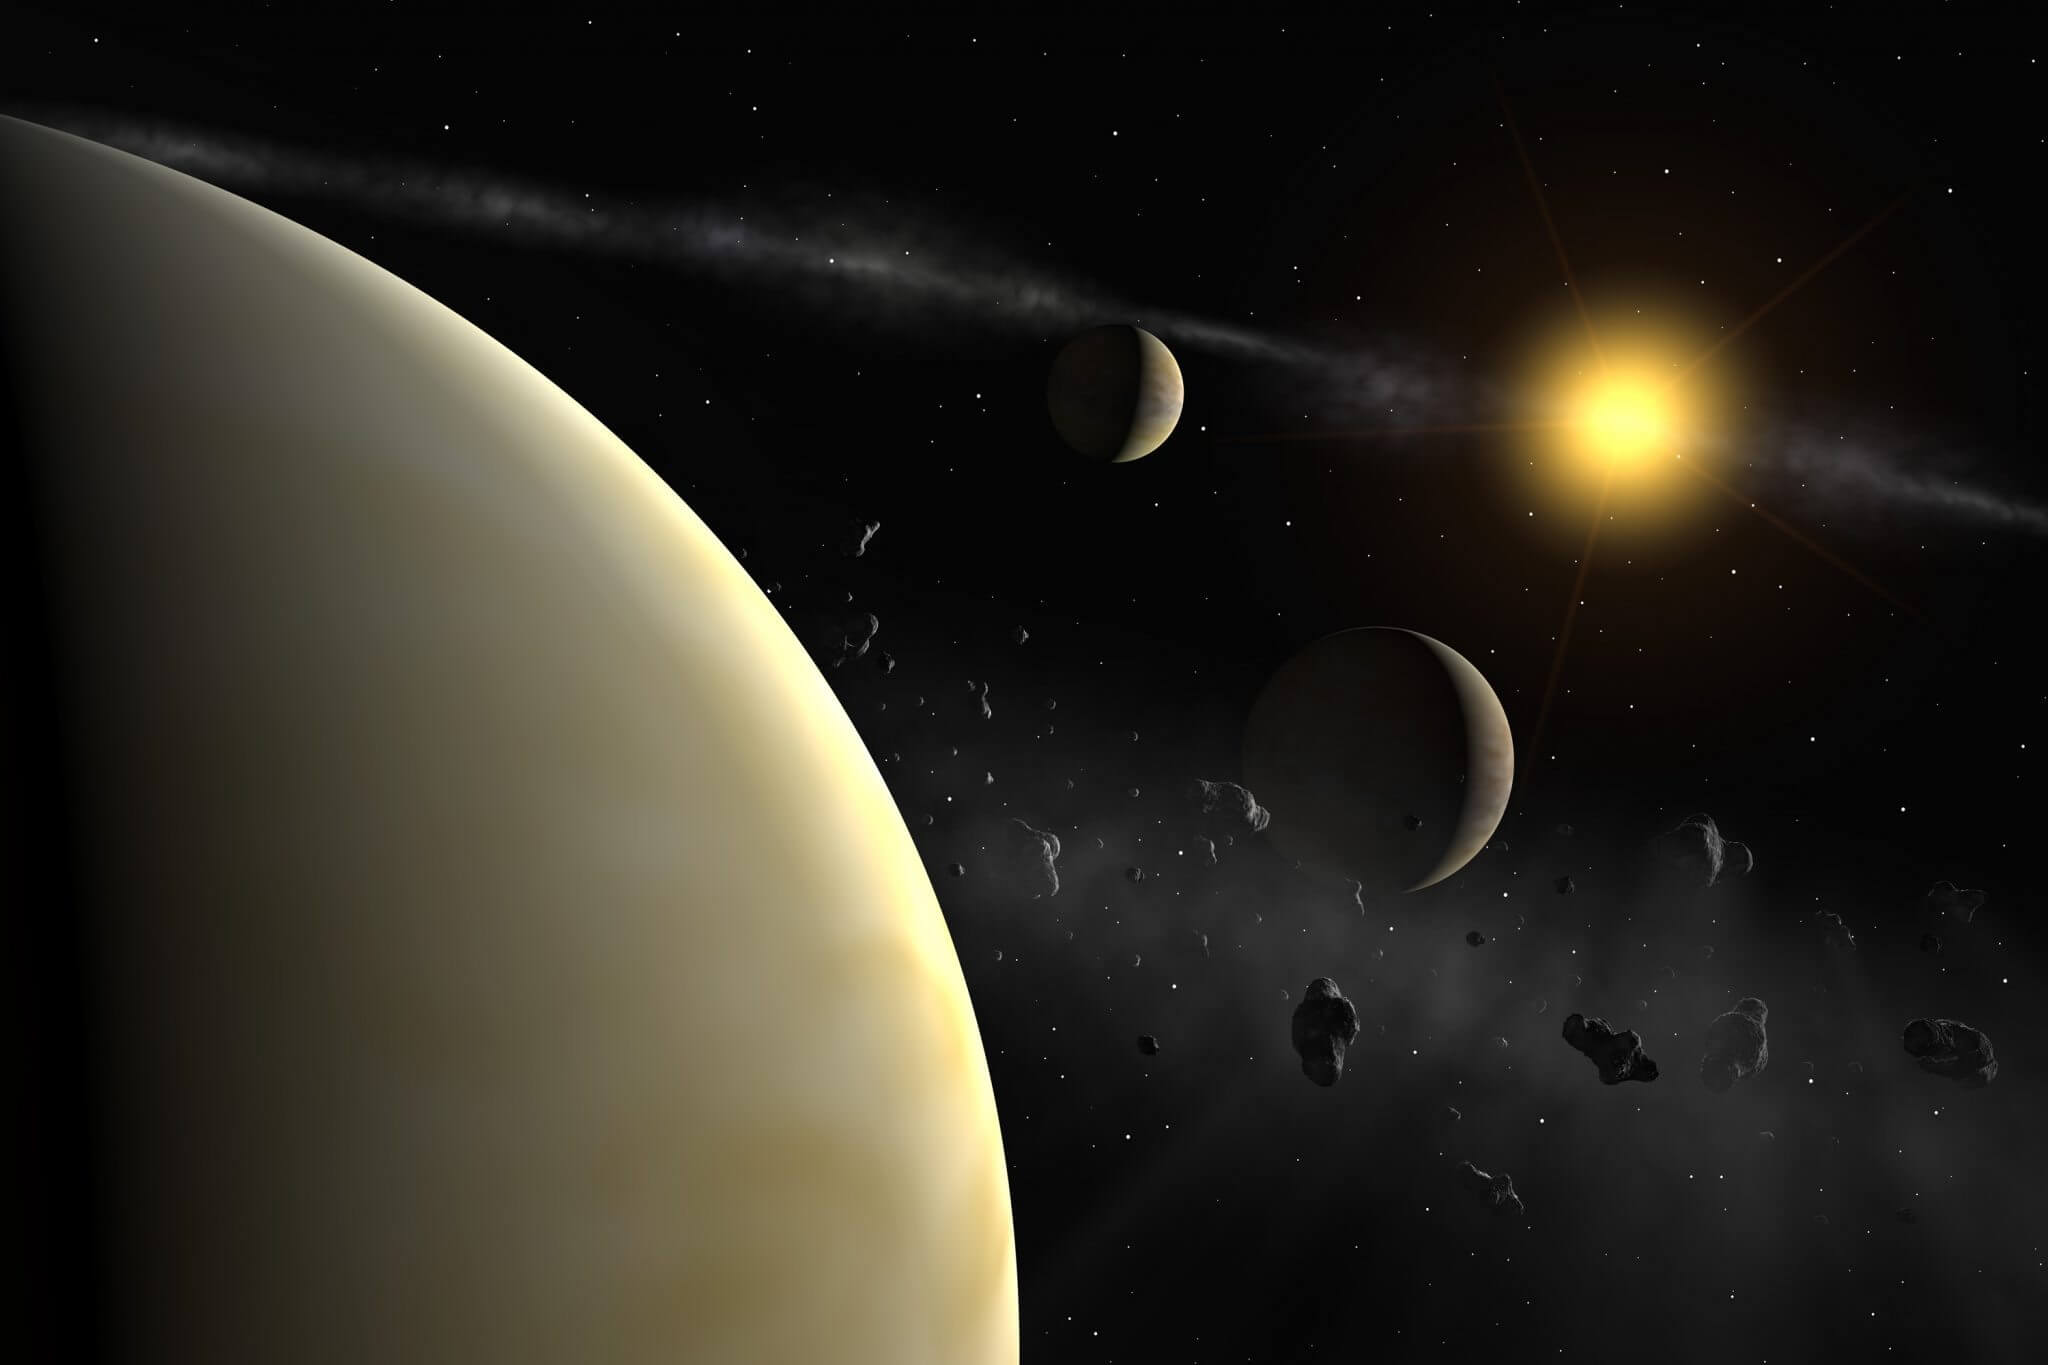 HD 131399Ab New Planet